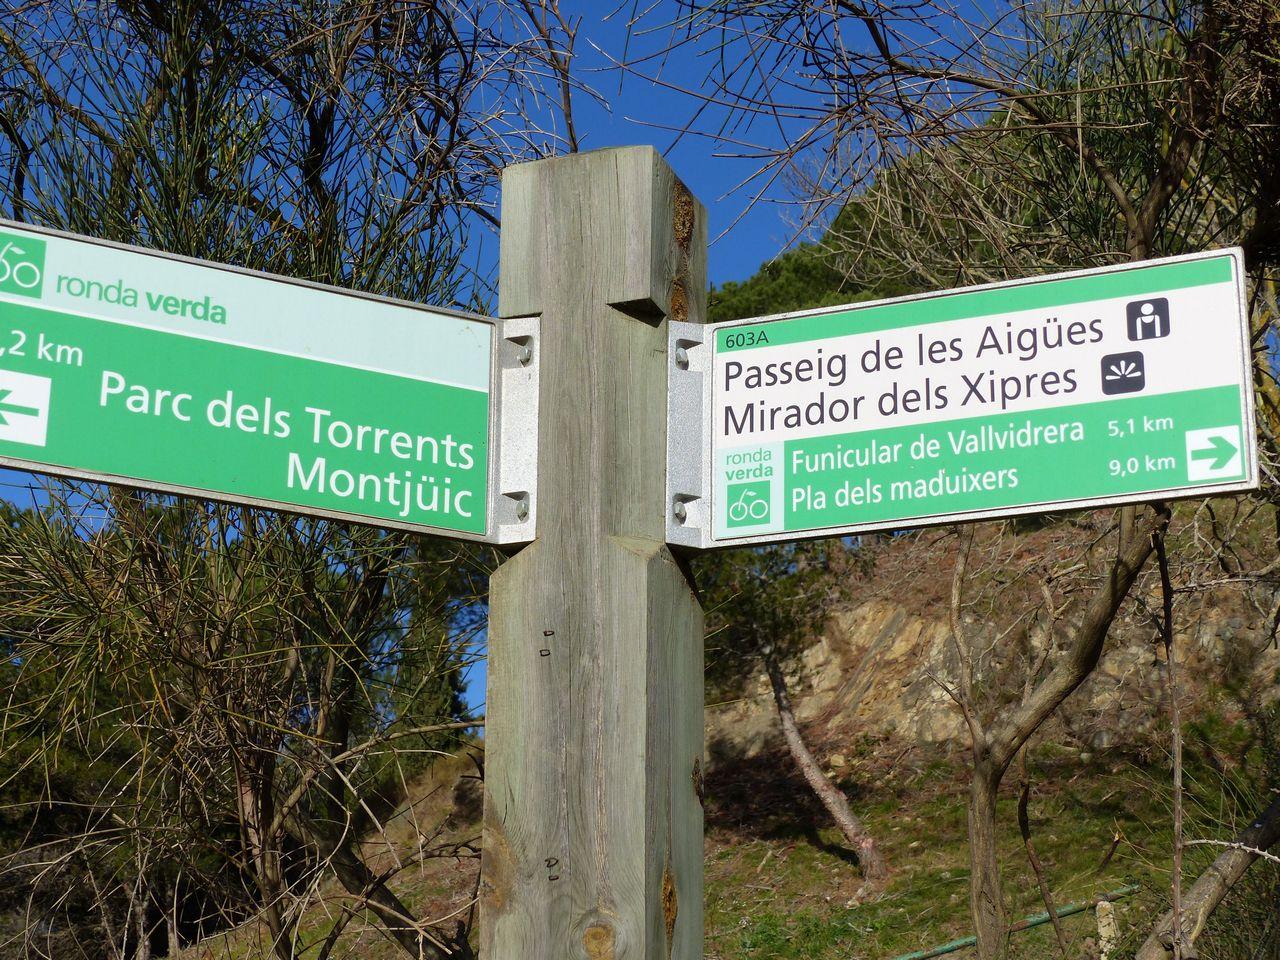 Desde elPla de les Maduixeres hastael Mirador dels Xiprers hay 9 kilómetros.